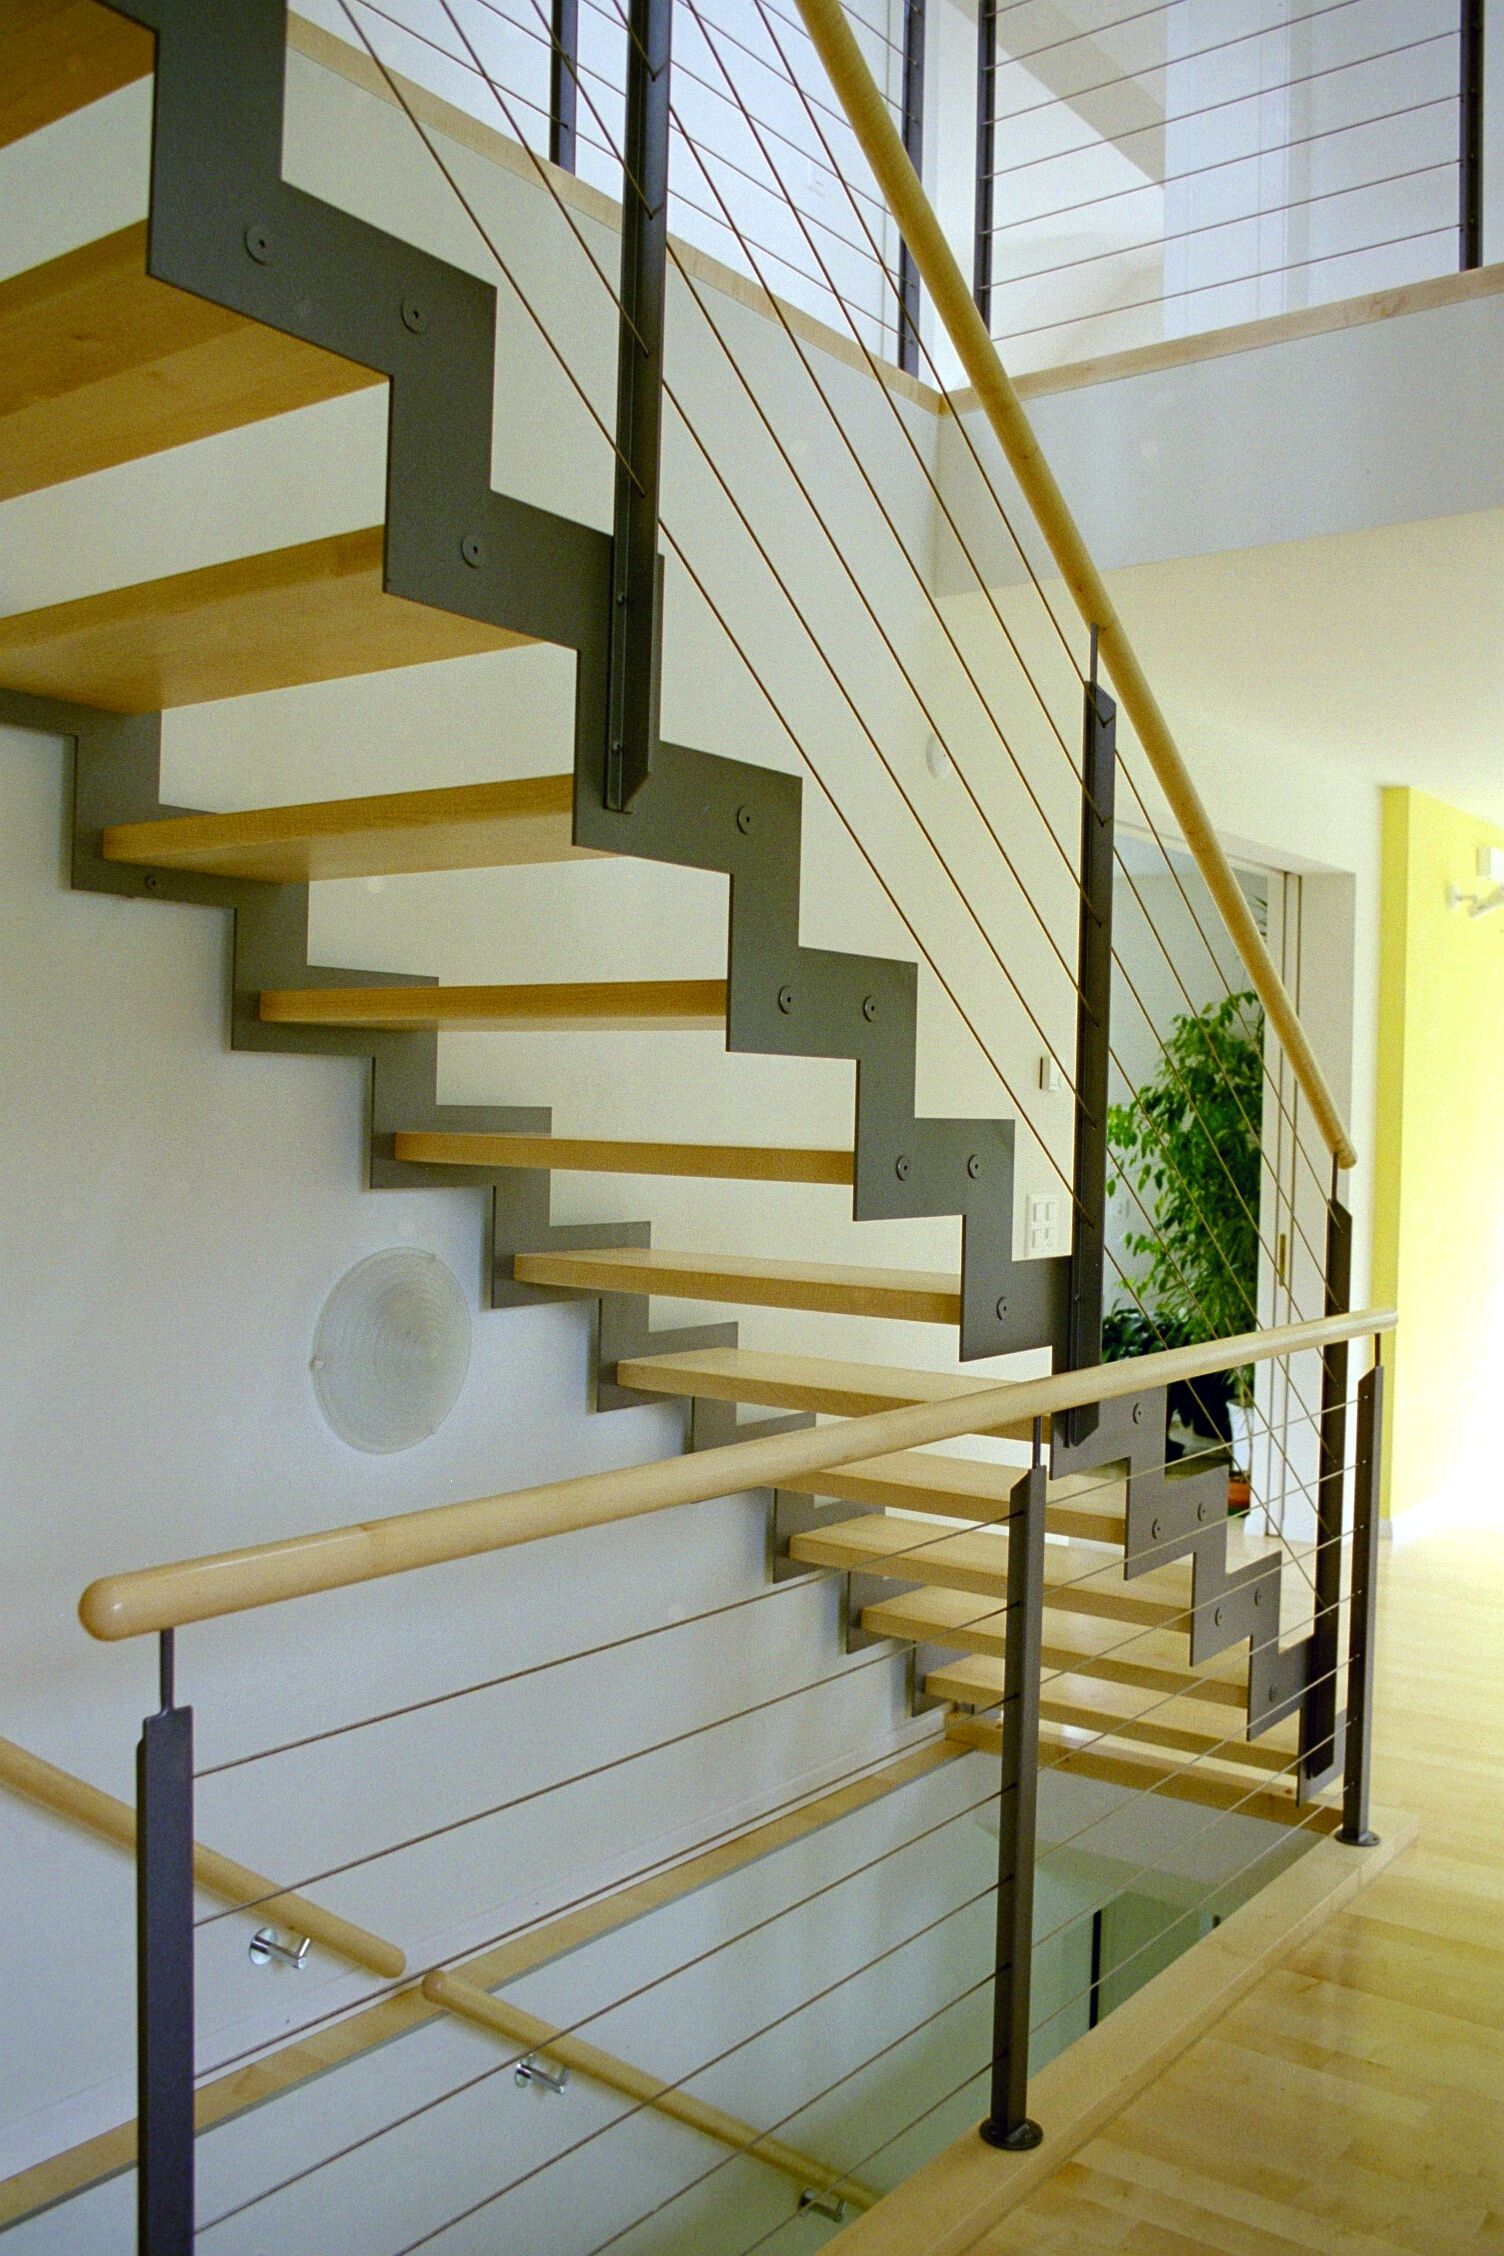 Stair Image 18